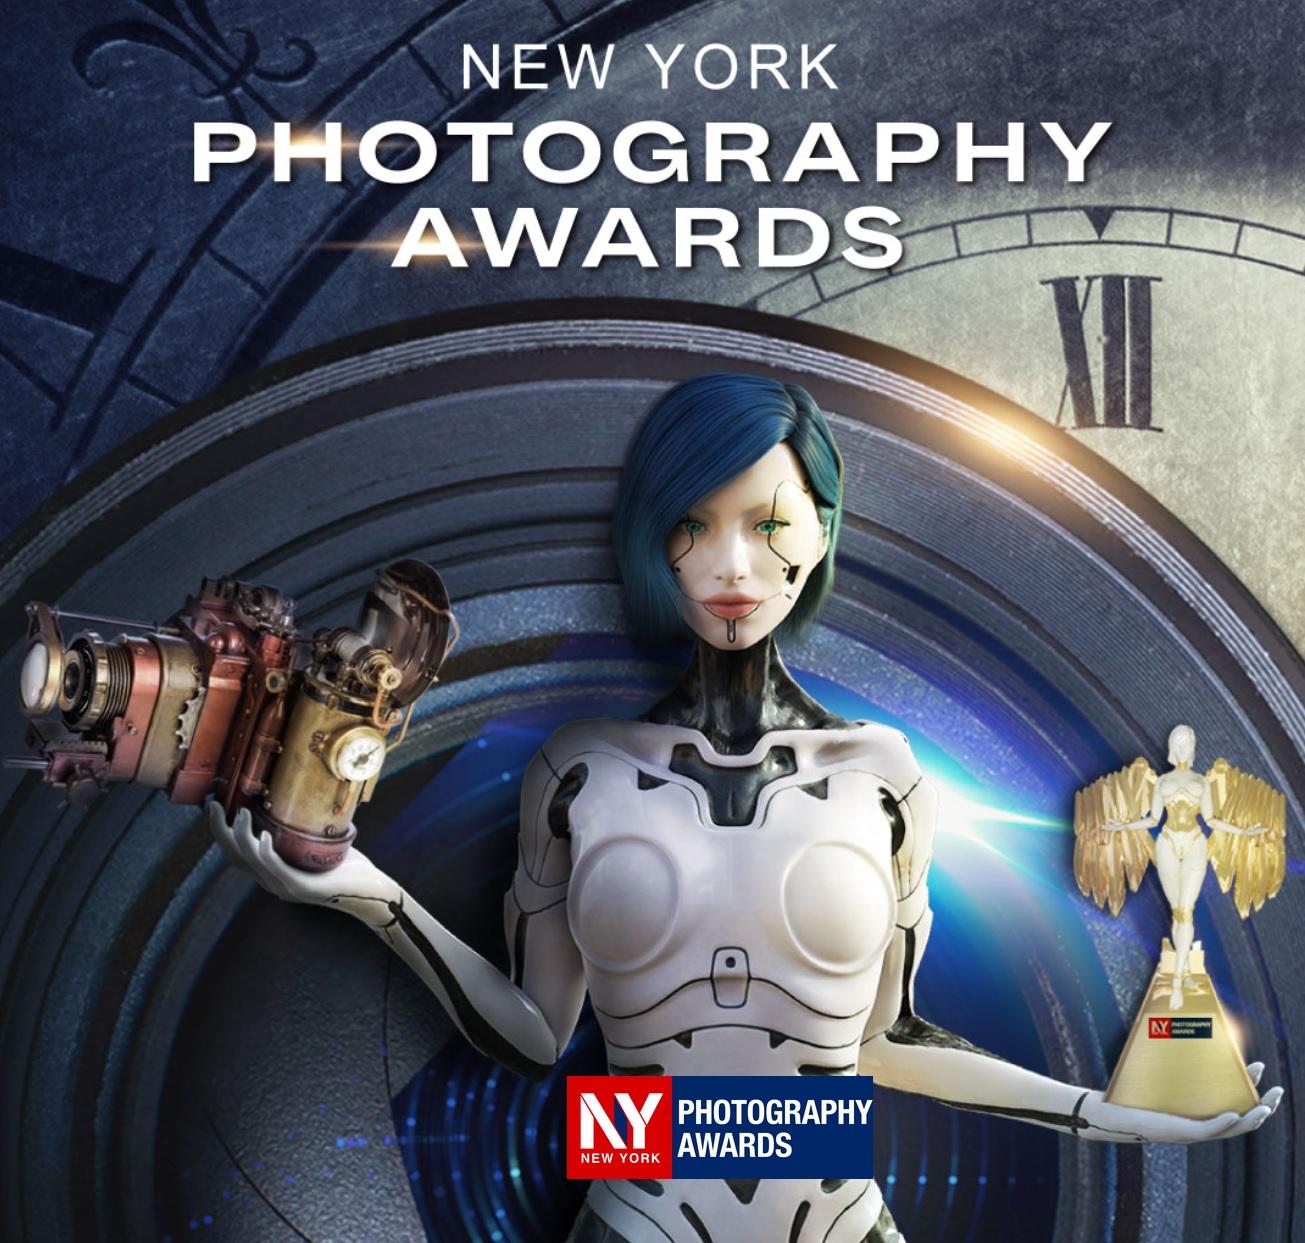 NEW YORK Photography Awards 2021 - logo